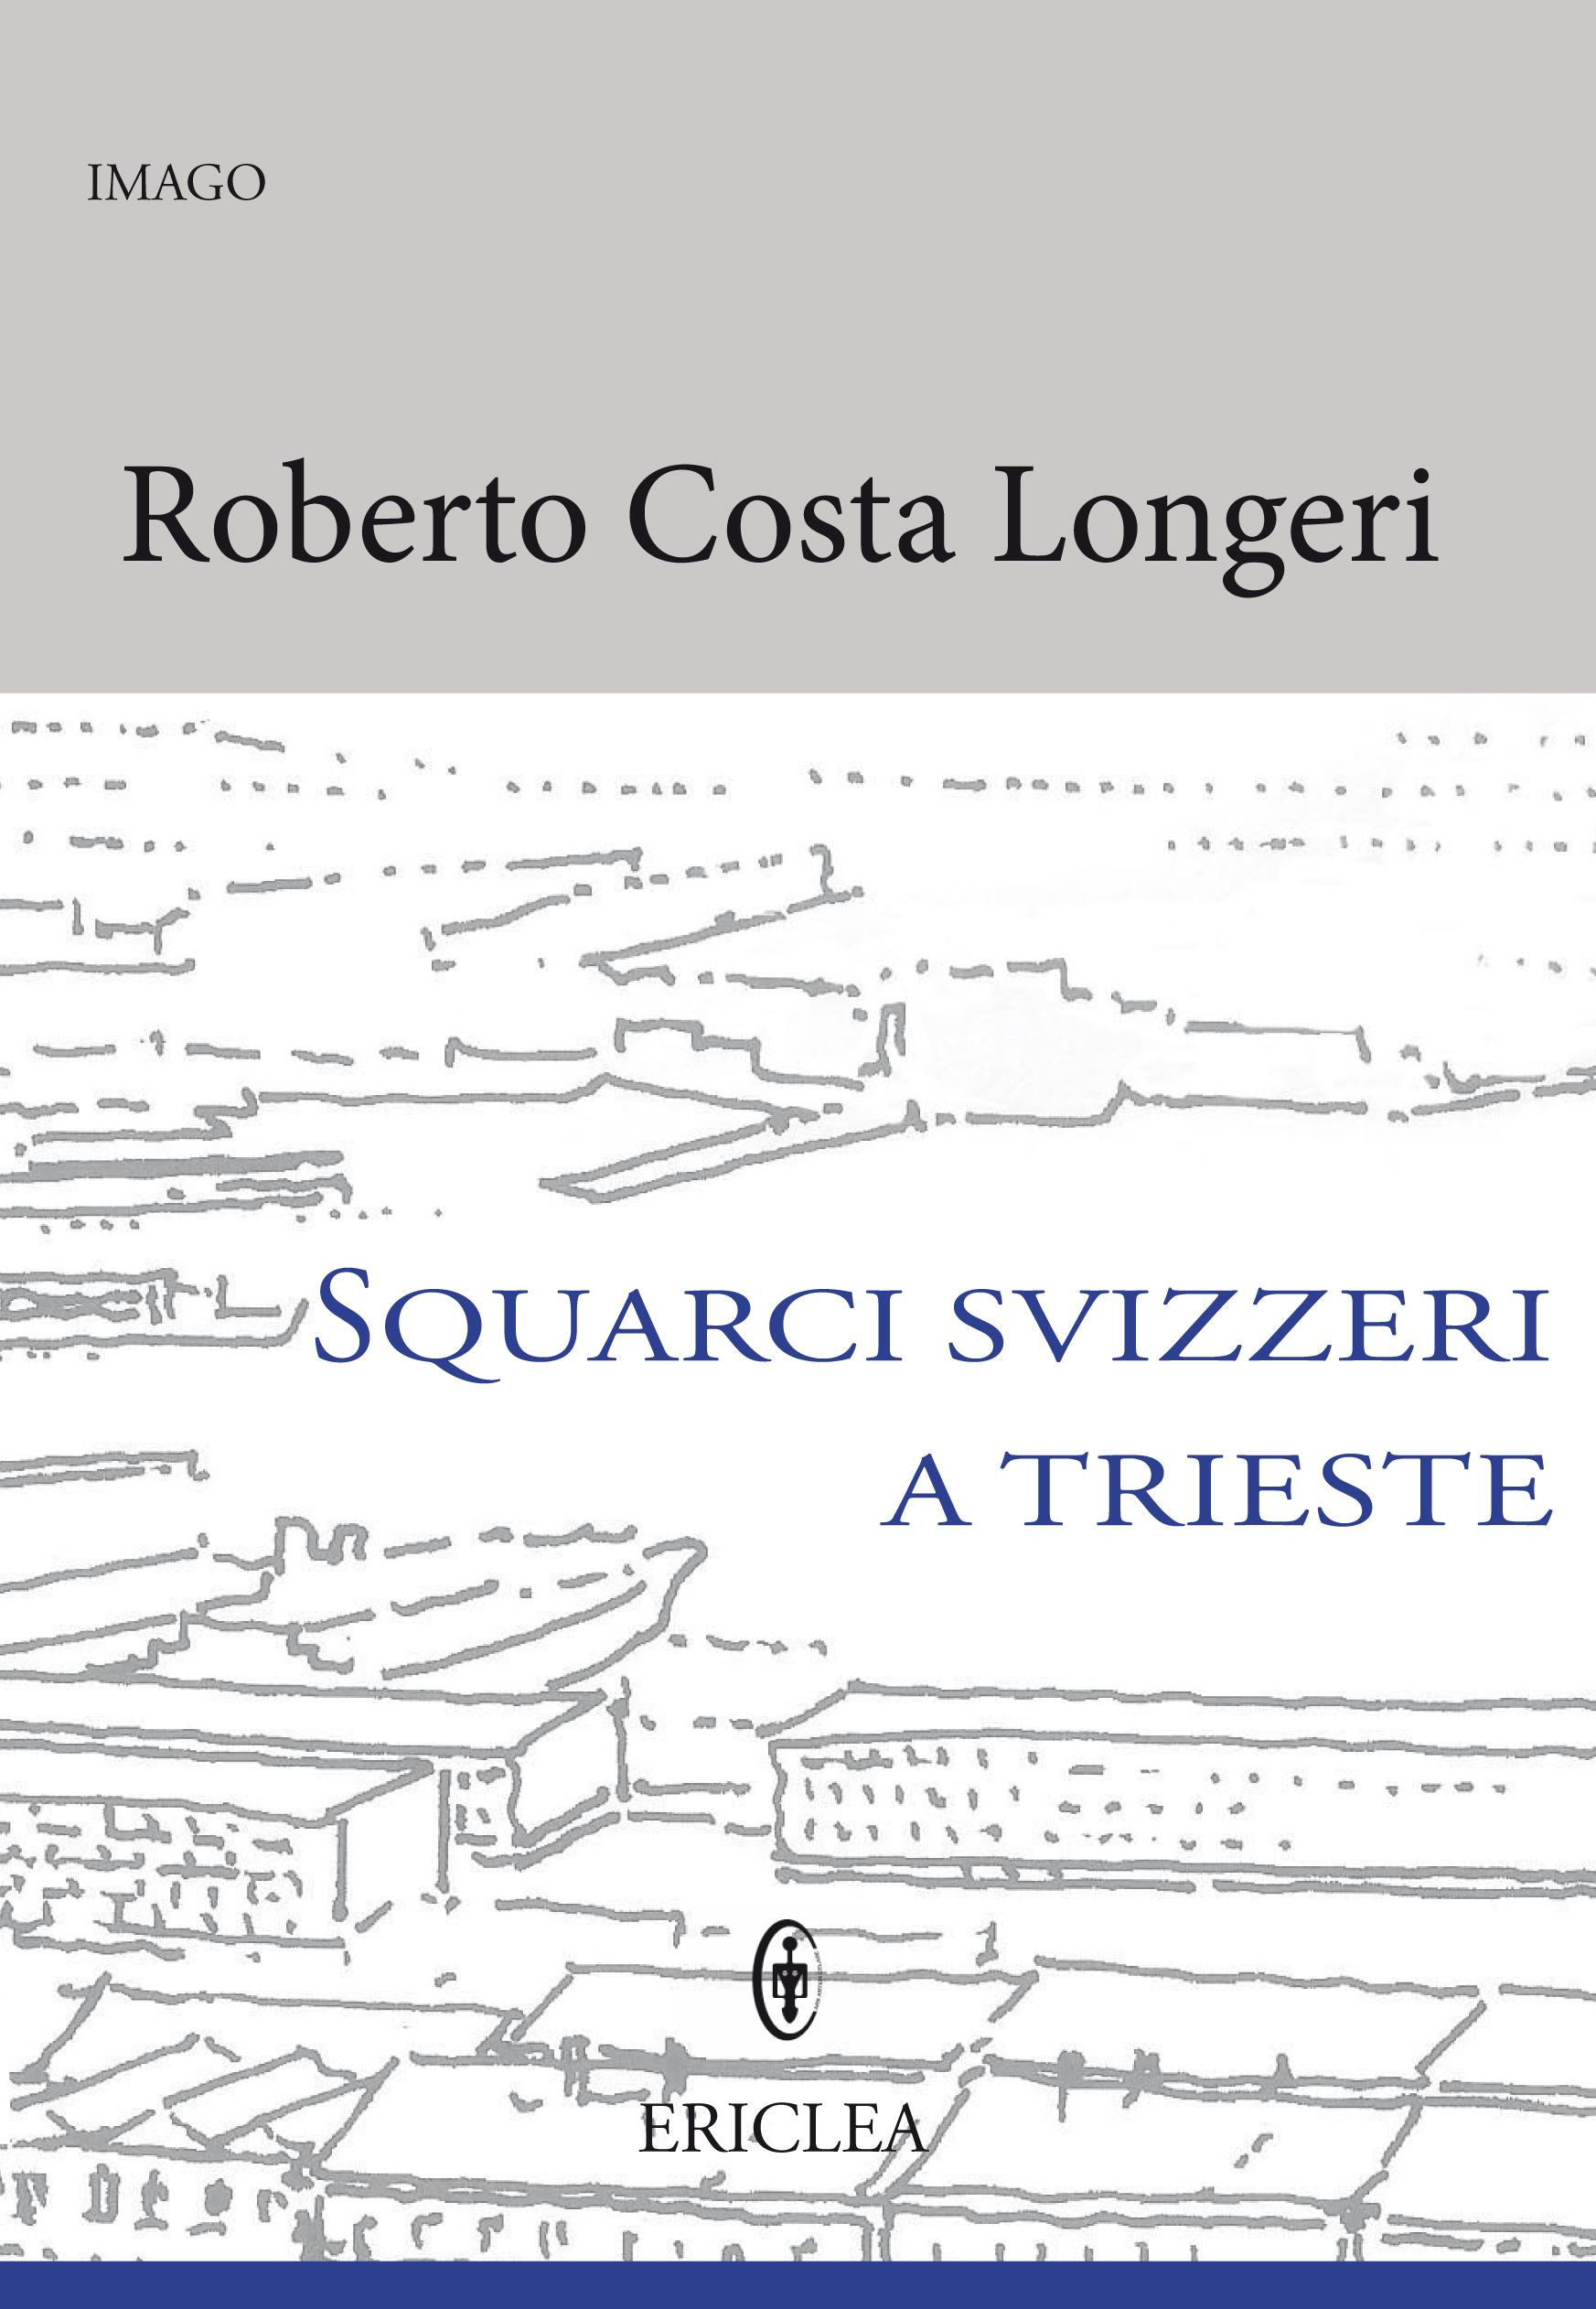 Roberto Costa Longeri